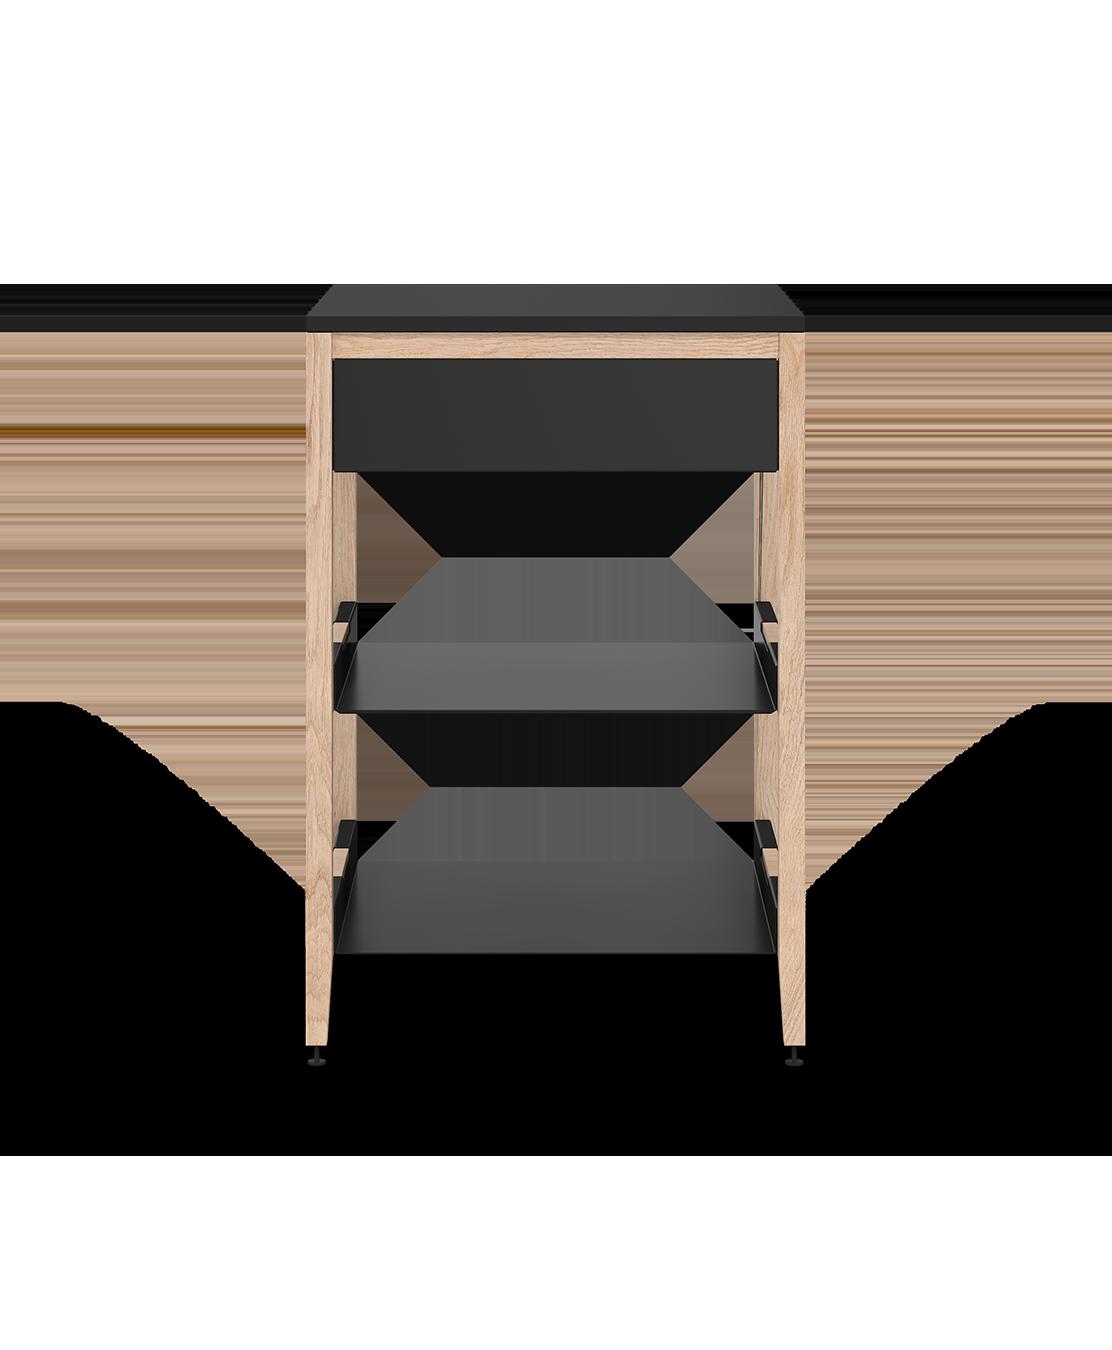 coquo radix white oak solid wood modular 2 shelves false front base corner kitchen cabinet 24 inch C1-CC-24SB-0022-NA